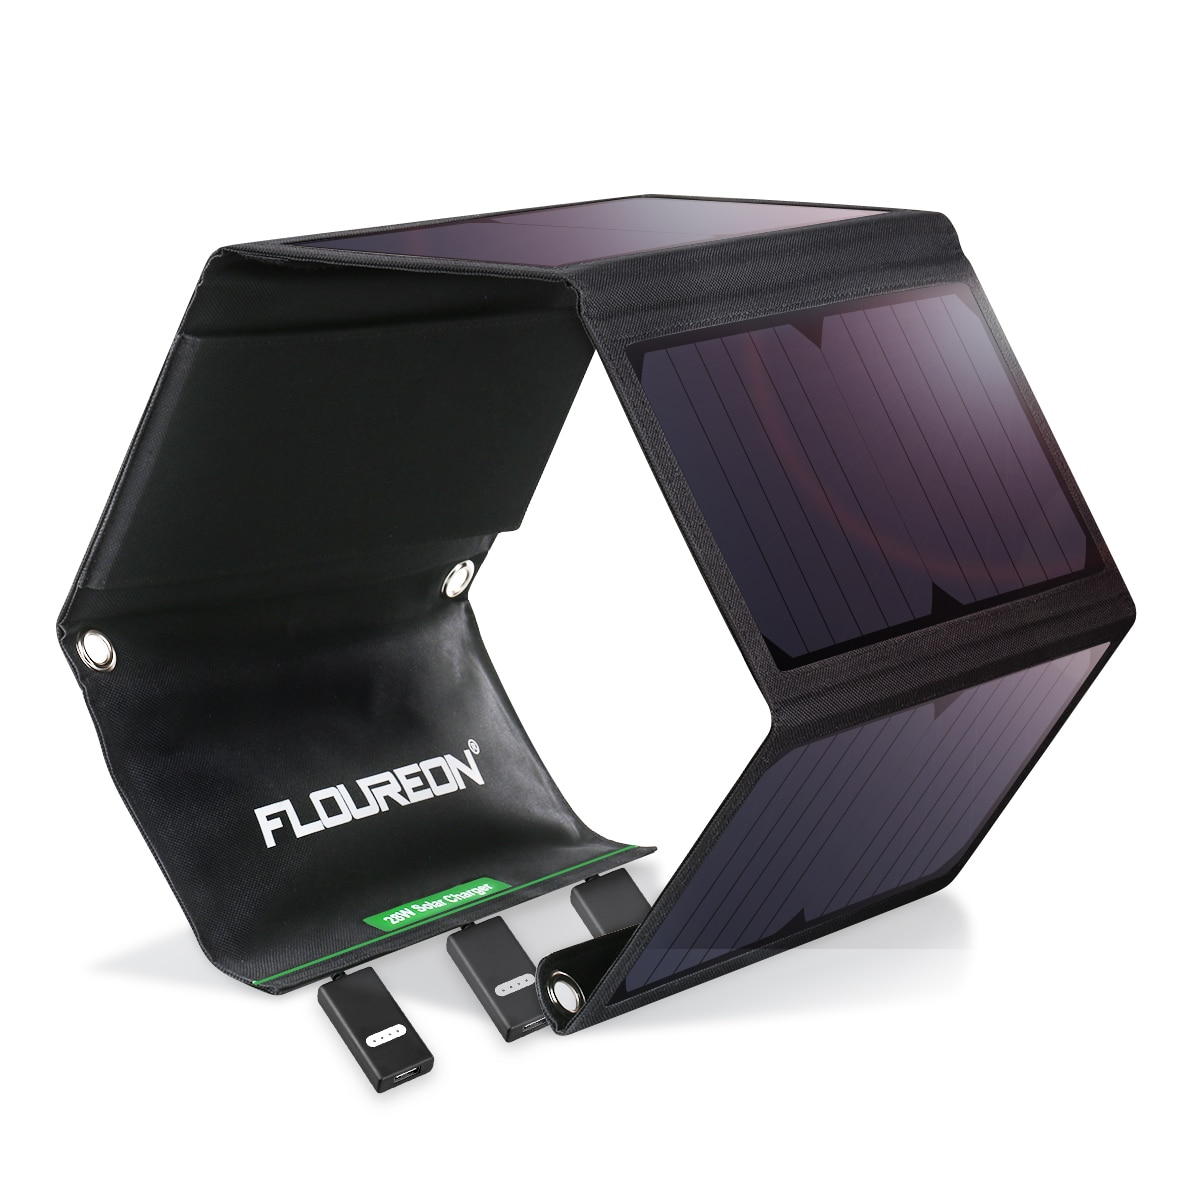 Cargador de Panel Solar impermeable plegable FLOUREON 28W, Banco de energía móvil para tabletas de teléfonos inteligentes, cargadores de exterior con puertos USB triples